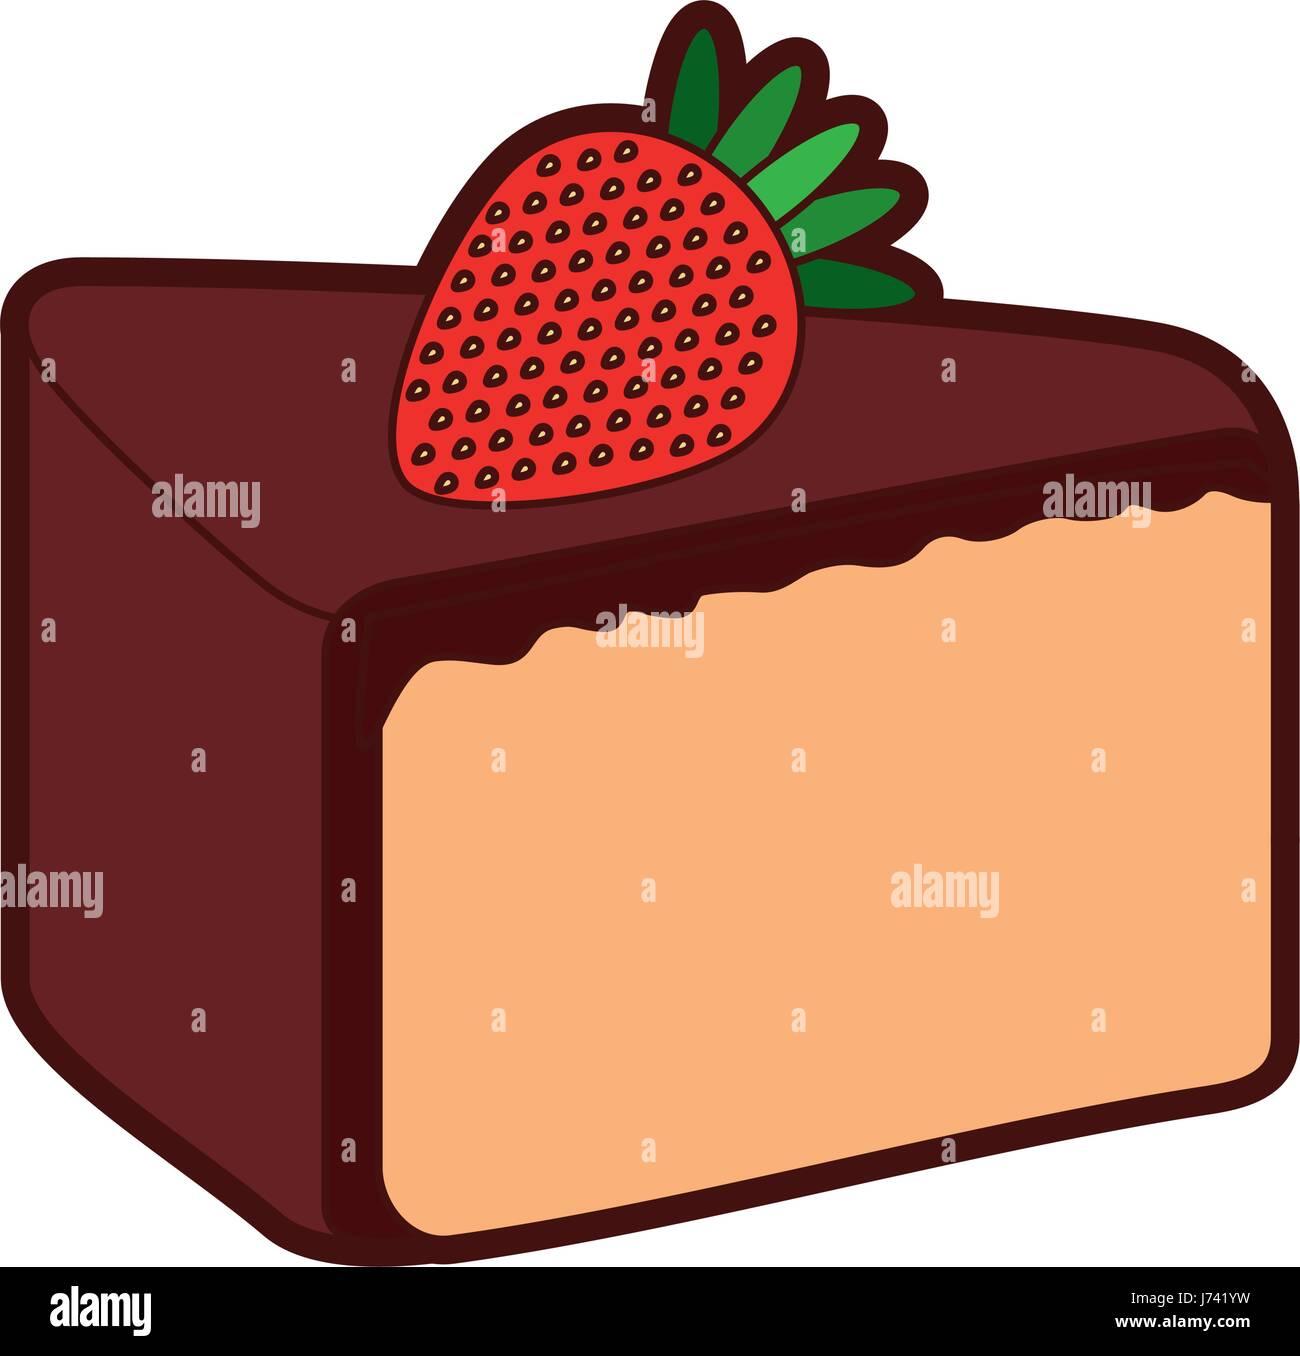 19c3063b75d8 yummy sweet cake slide piece Stock Vector Art   Illustration